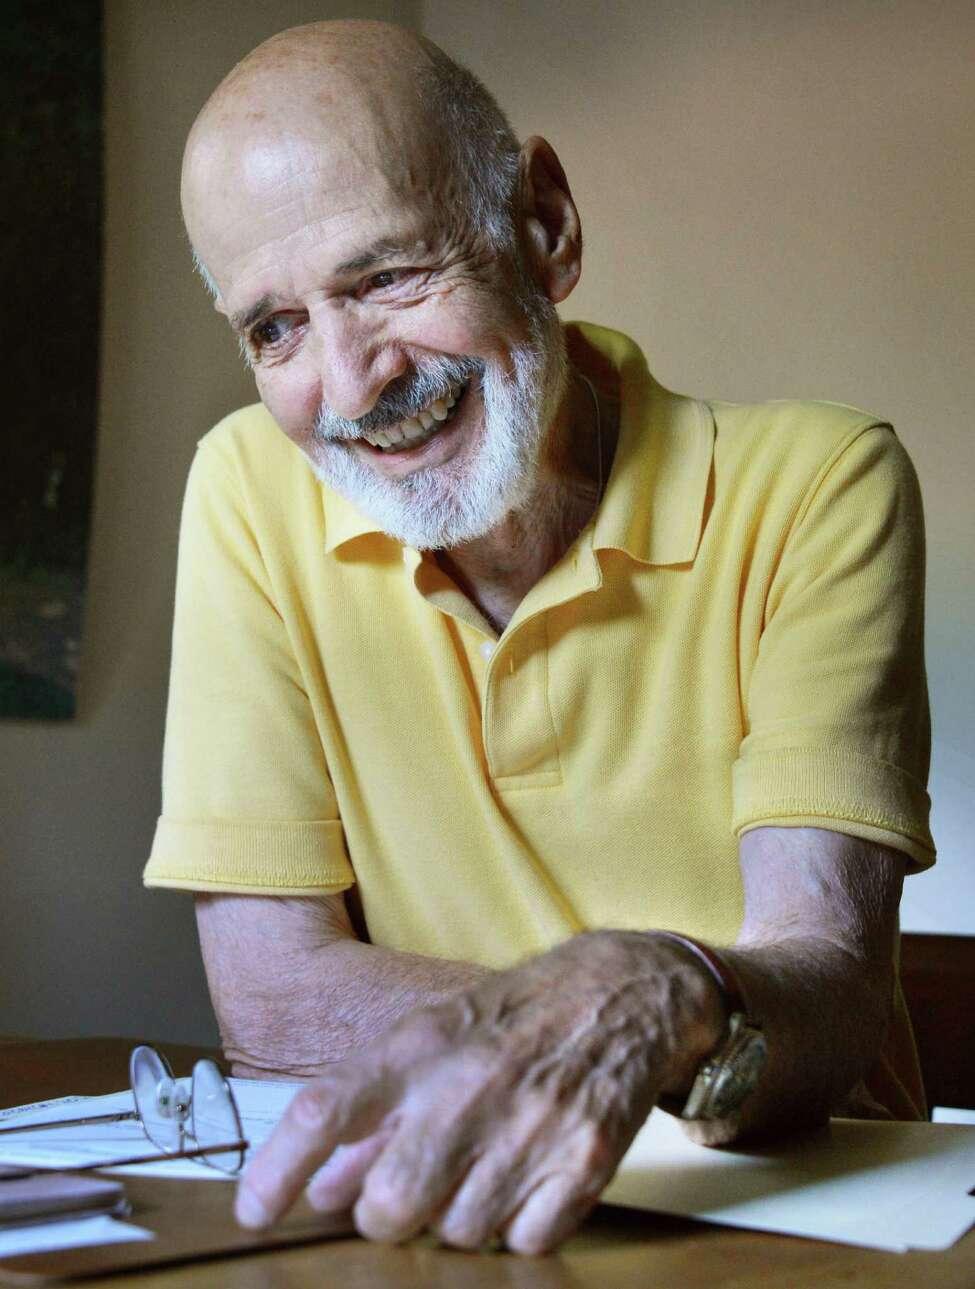 Novelist Eugene Mirabelli, a retired UAlbany English professor who at age 81 has published his 8th novel,